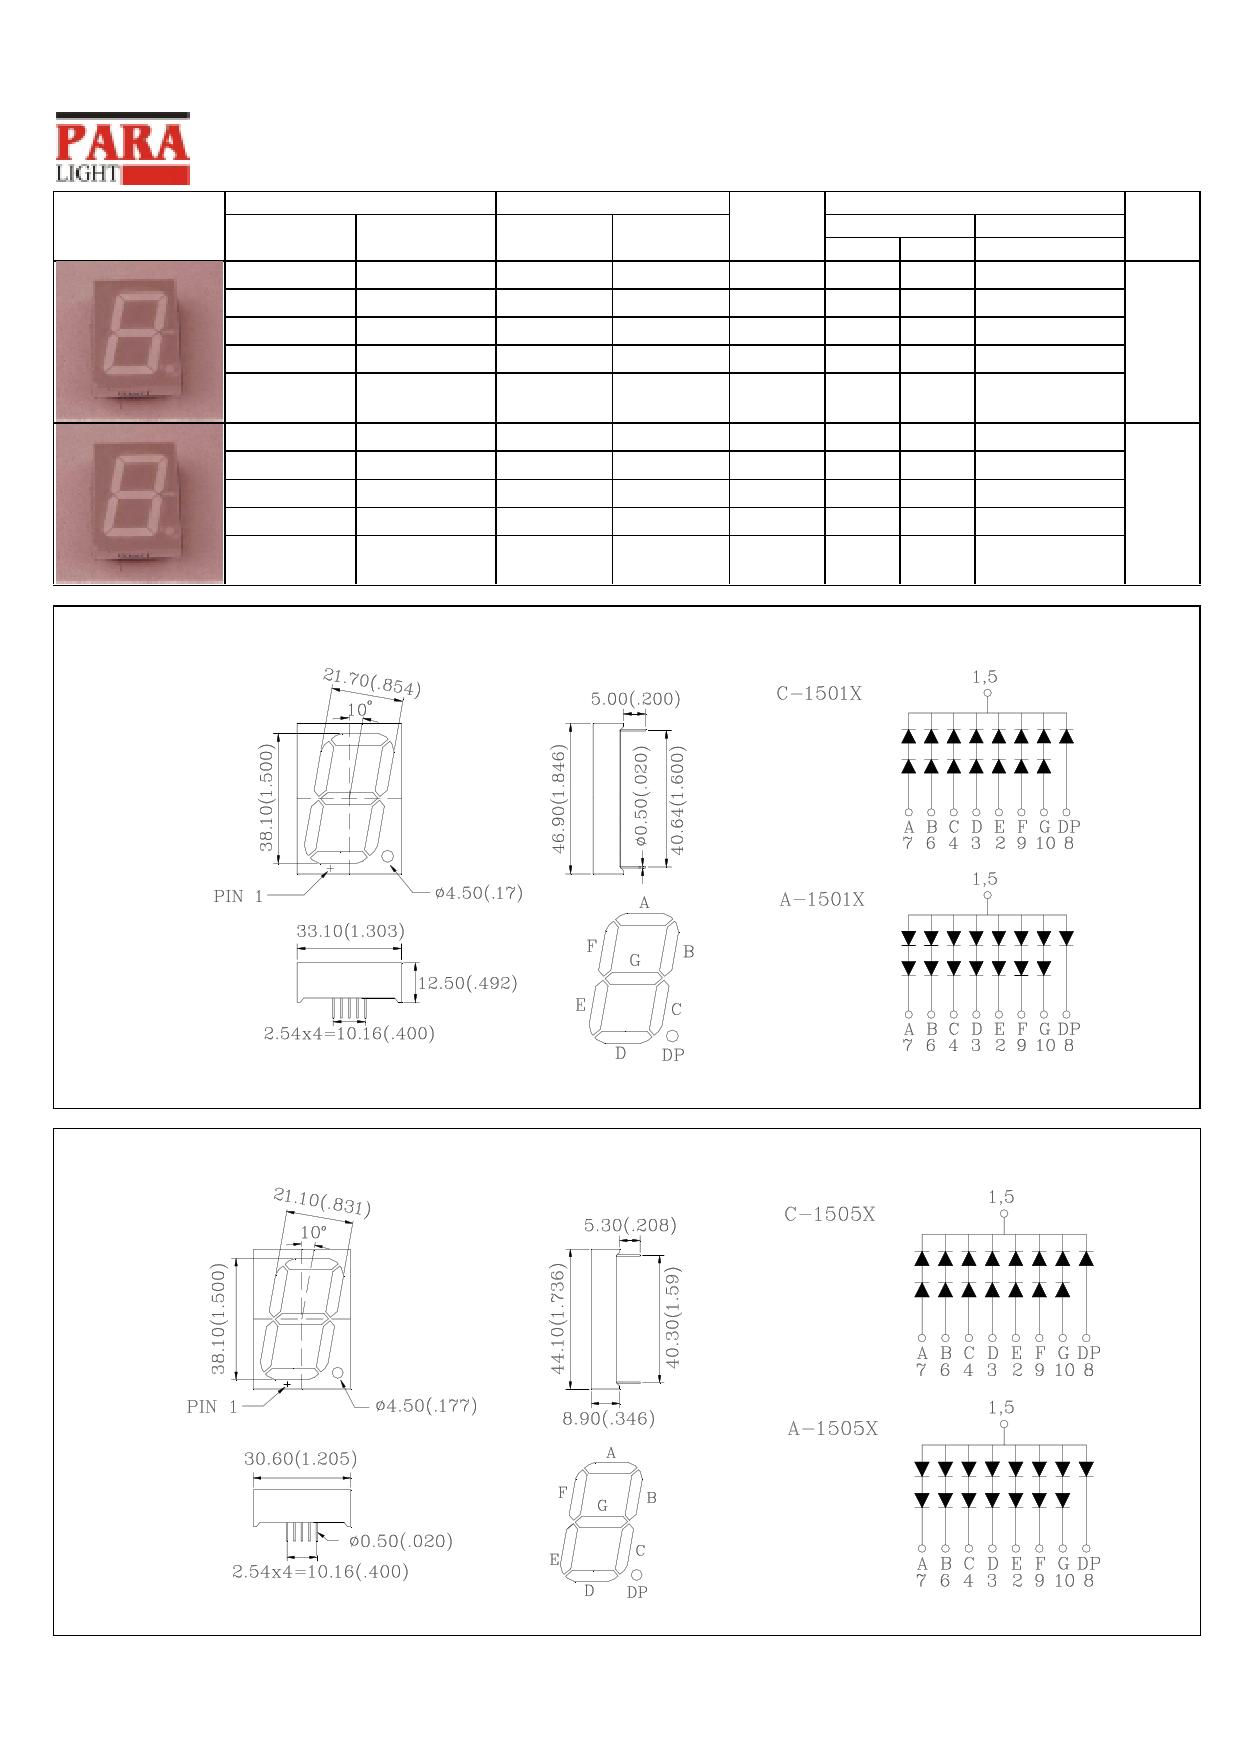 C-1505X datasheet